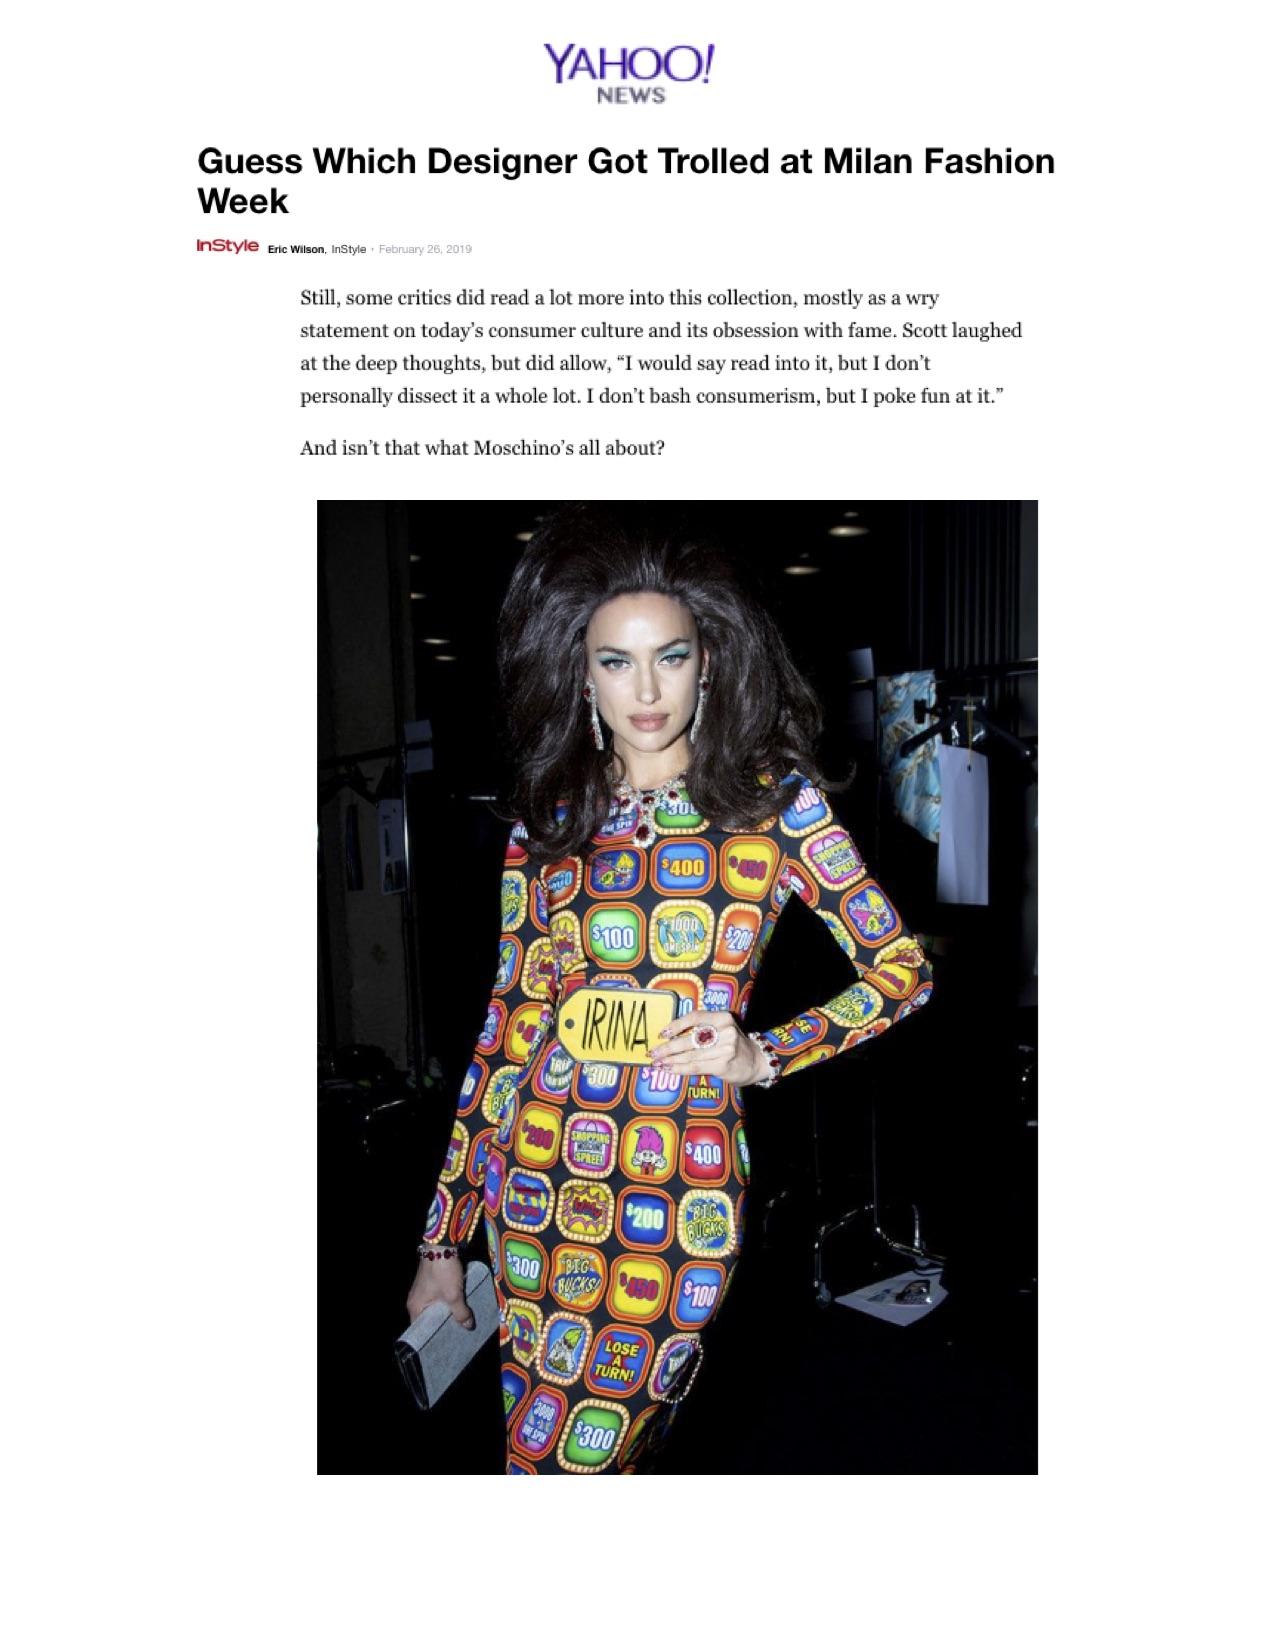 Yahoo News - Good Luck Trolls x Moschino 2.jpg